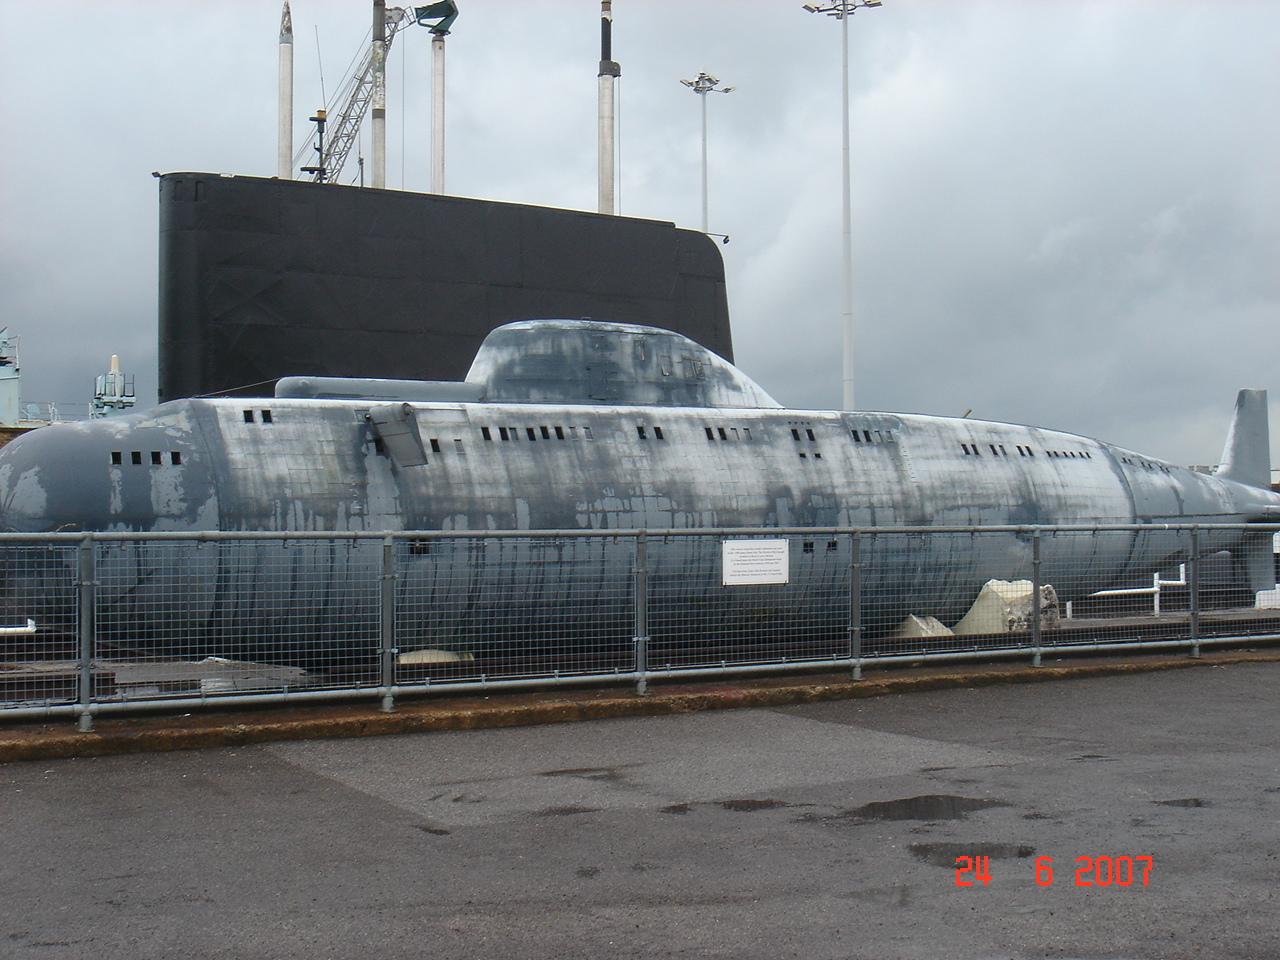 Chatham dockyard design plane for The chatham